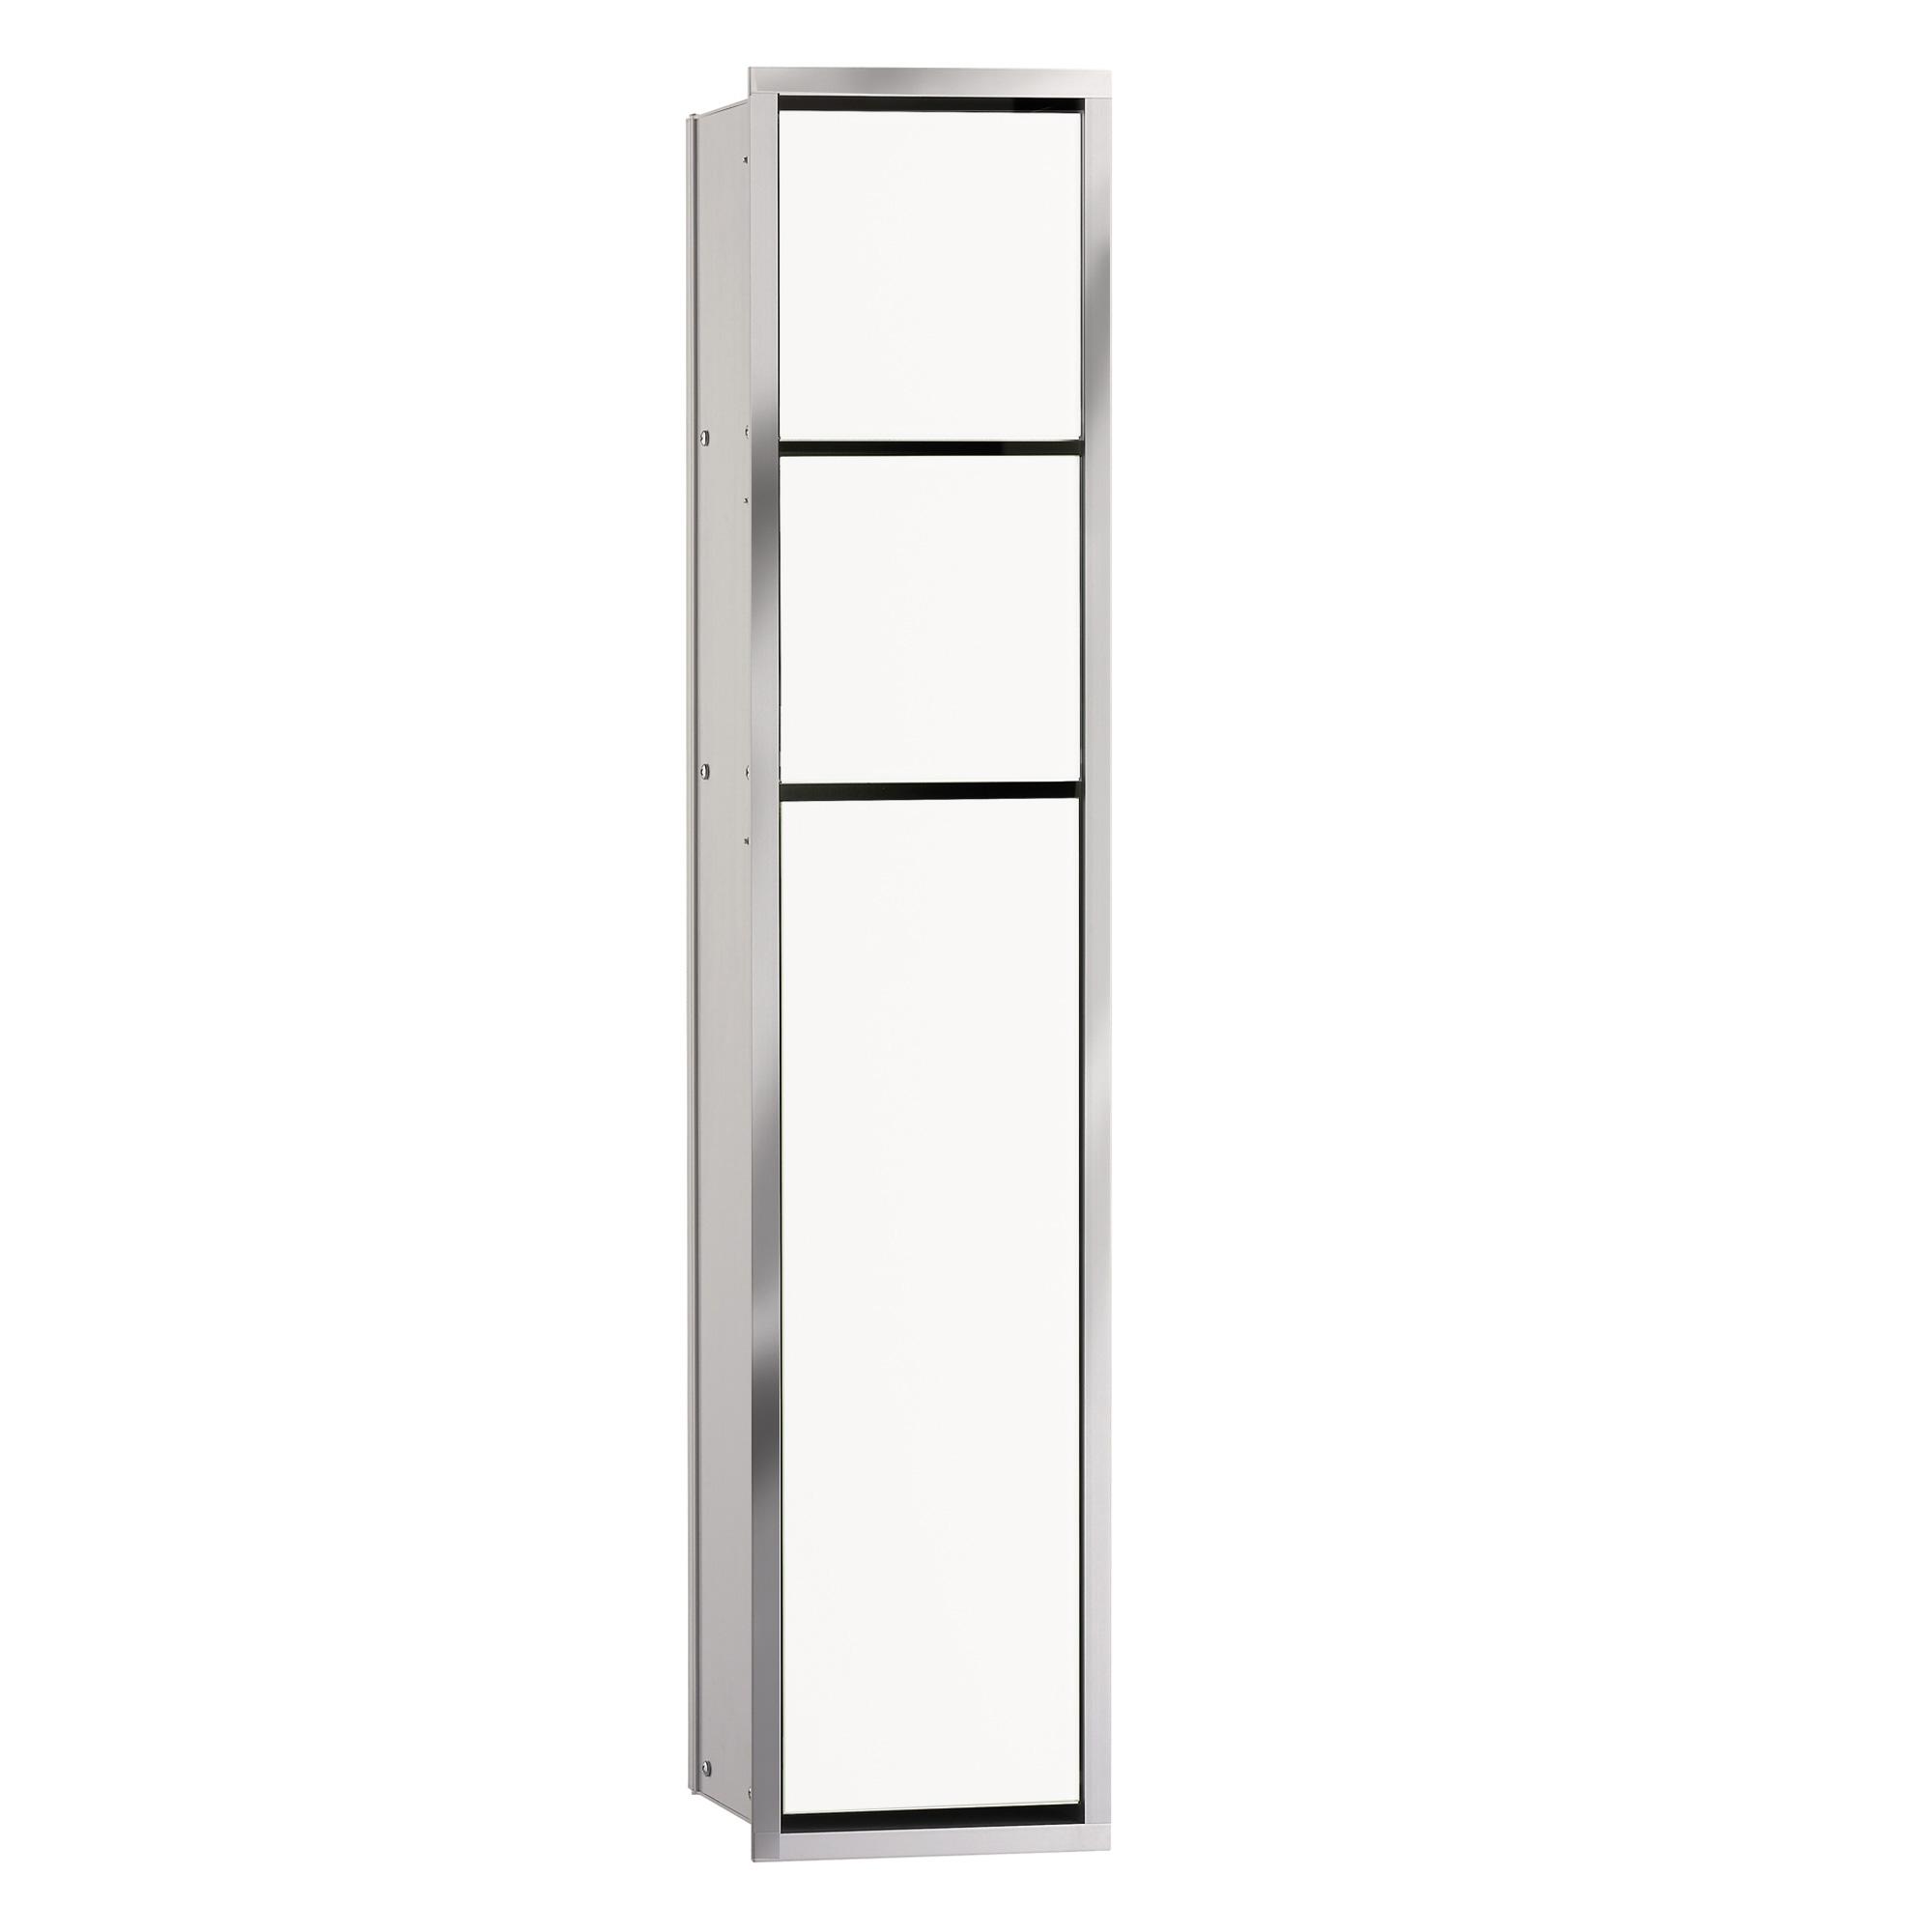 emco asis unterputz wc modul optiwhite chrom 975027850 reuter onlineshop. Black Bedroom Furniture Sets. Home Design Ideas